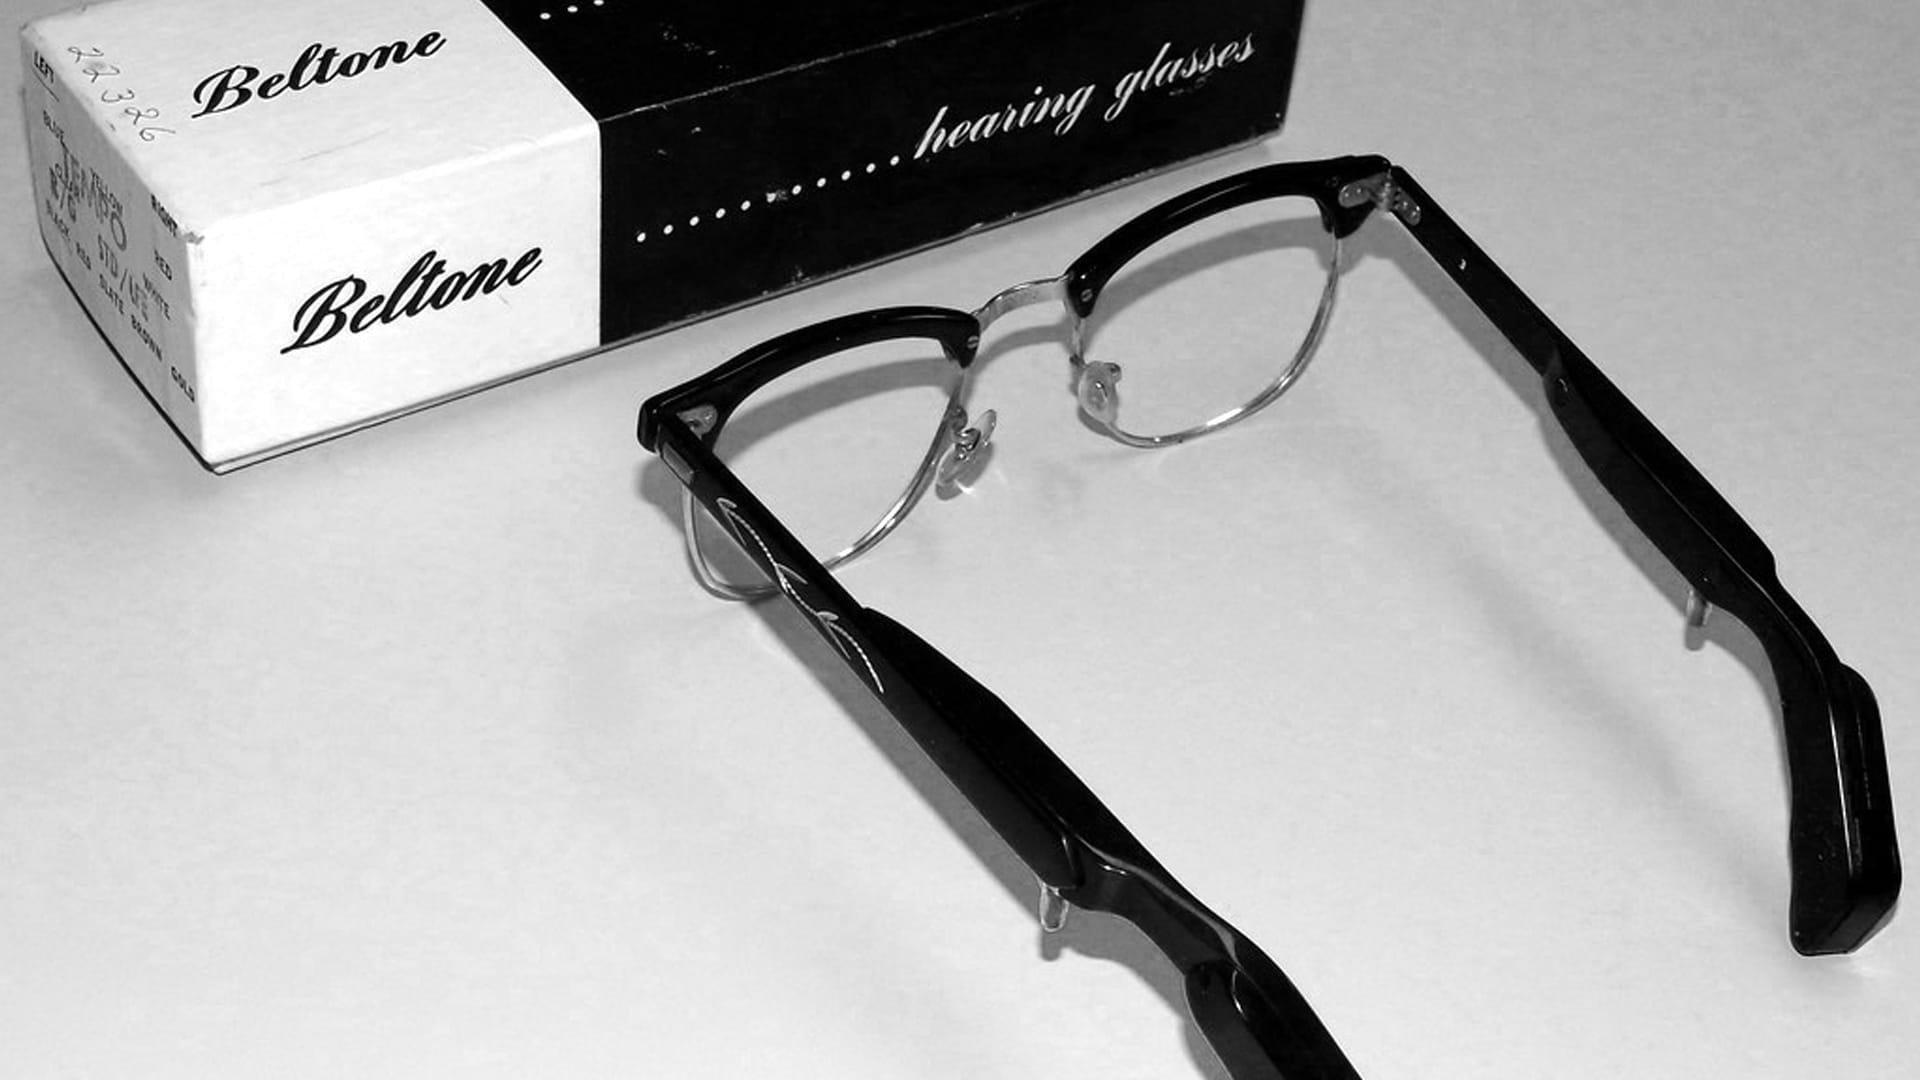 Beltone Hearing Glasses